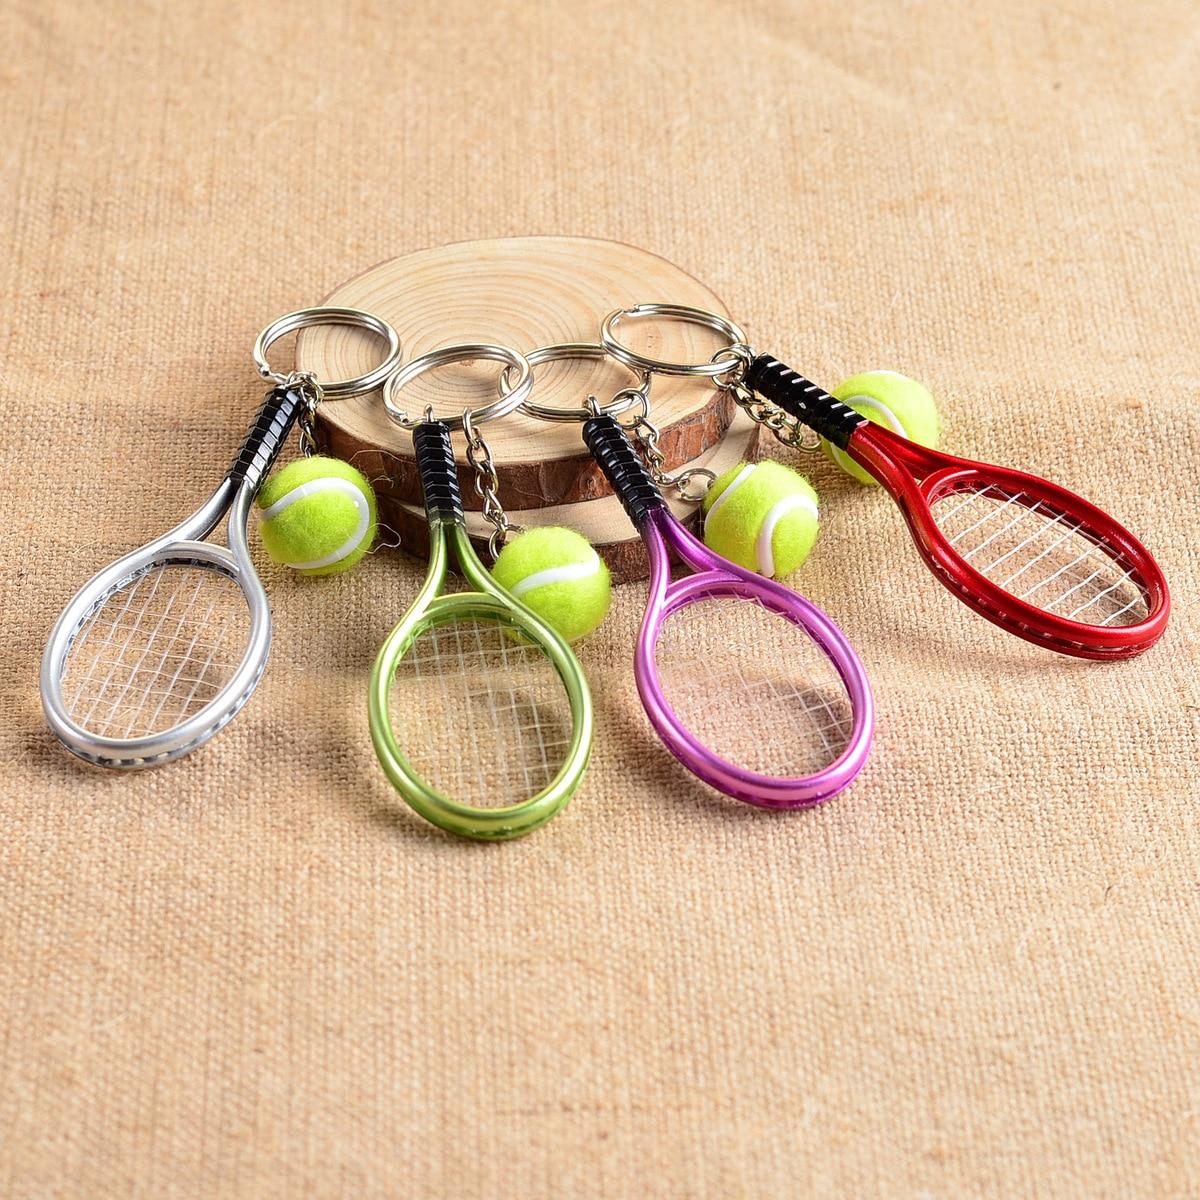 50pcs ZARSIA Mini Tennis Tennis Racket Key Buckle Tennis Balls Keychain Advertisement Promotion Activity Propaganda Gift